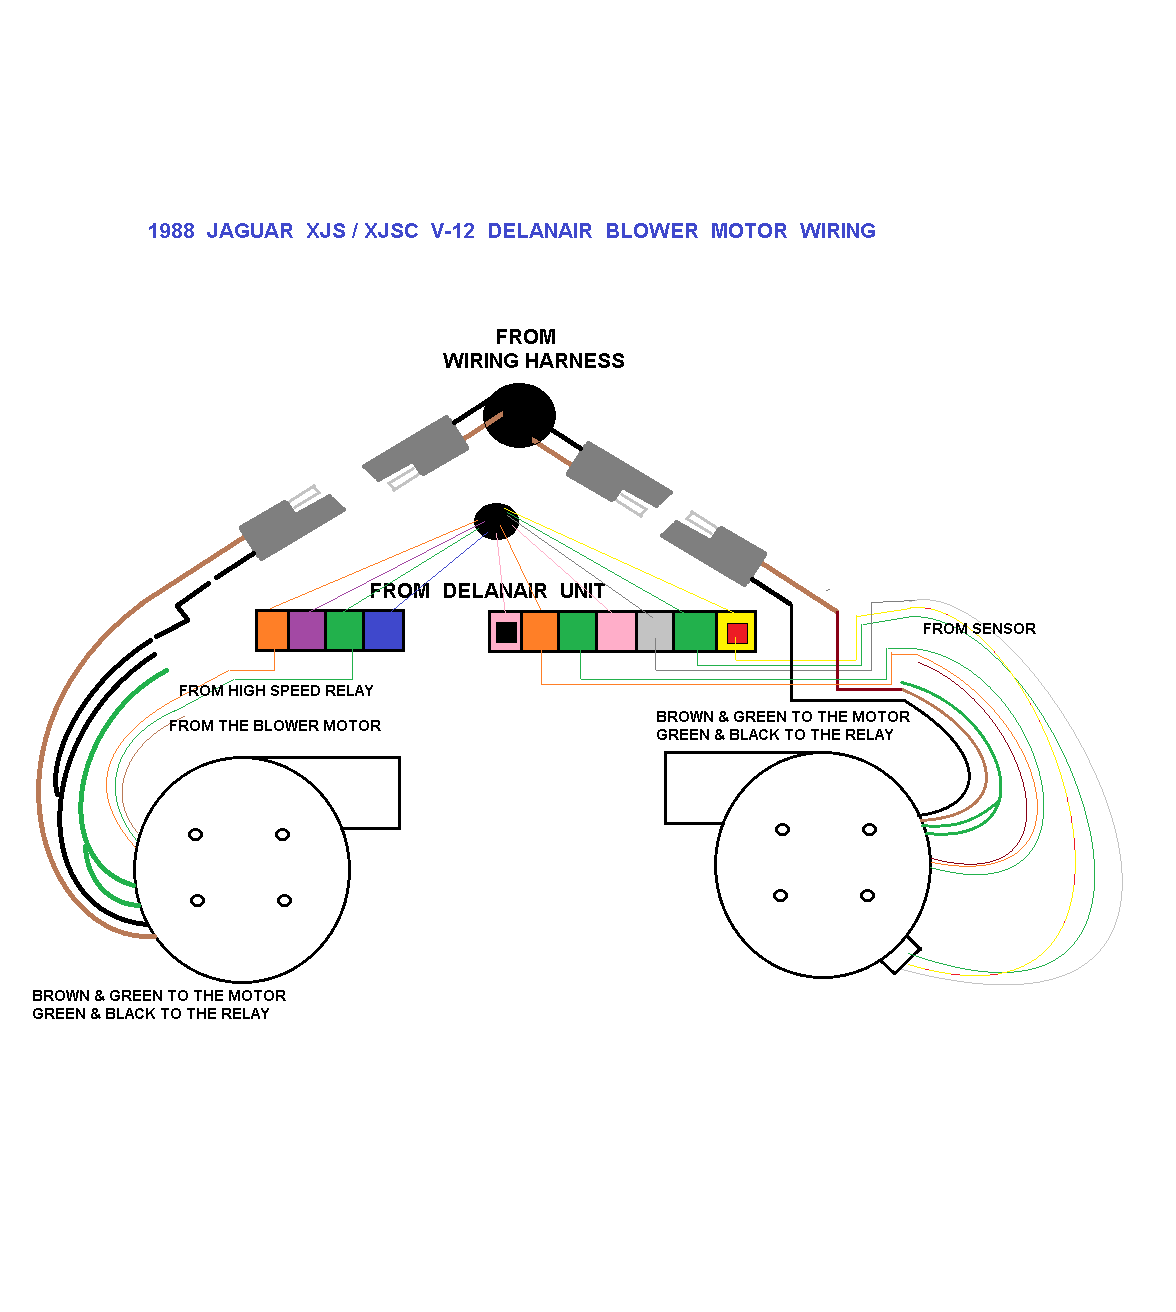 hight resolution of 1988 jaguar xjs wiring diagram wire center